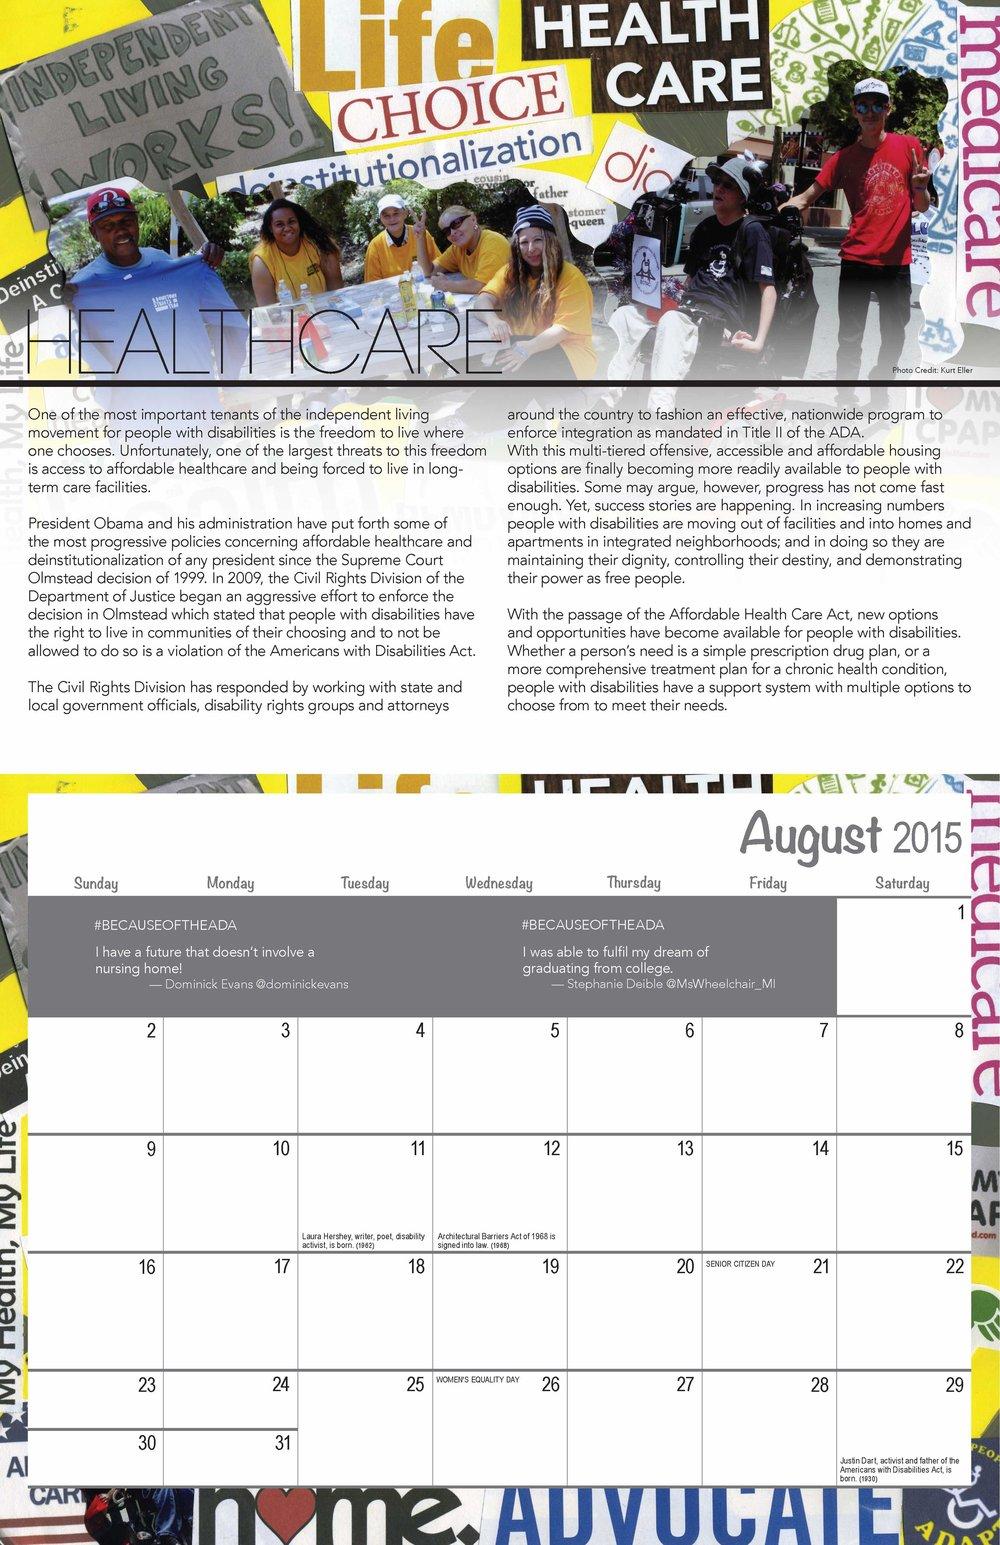 SVILC 2015 Calendar  August spread